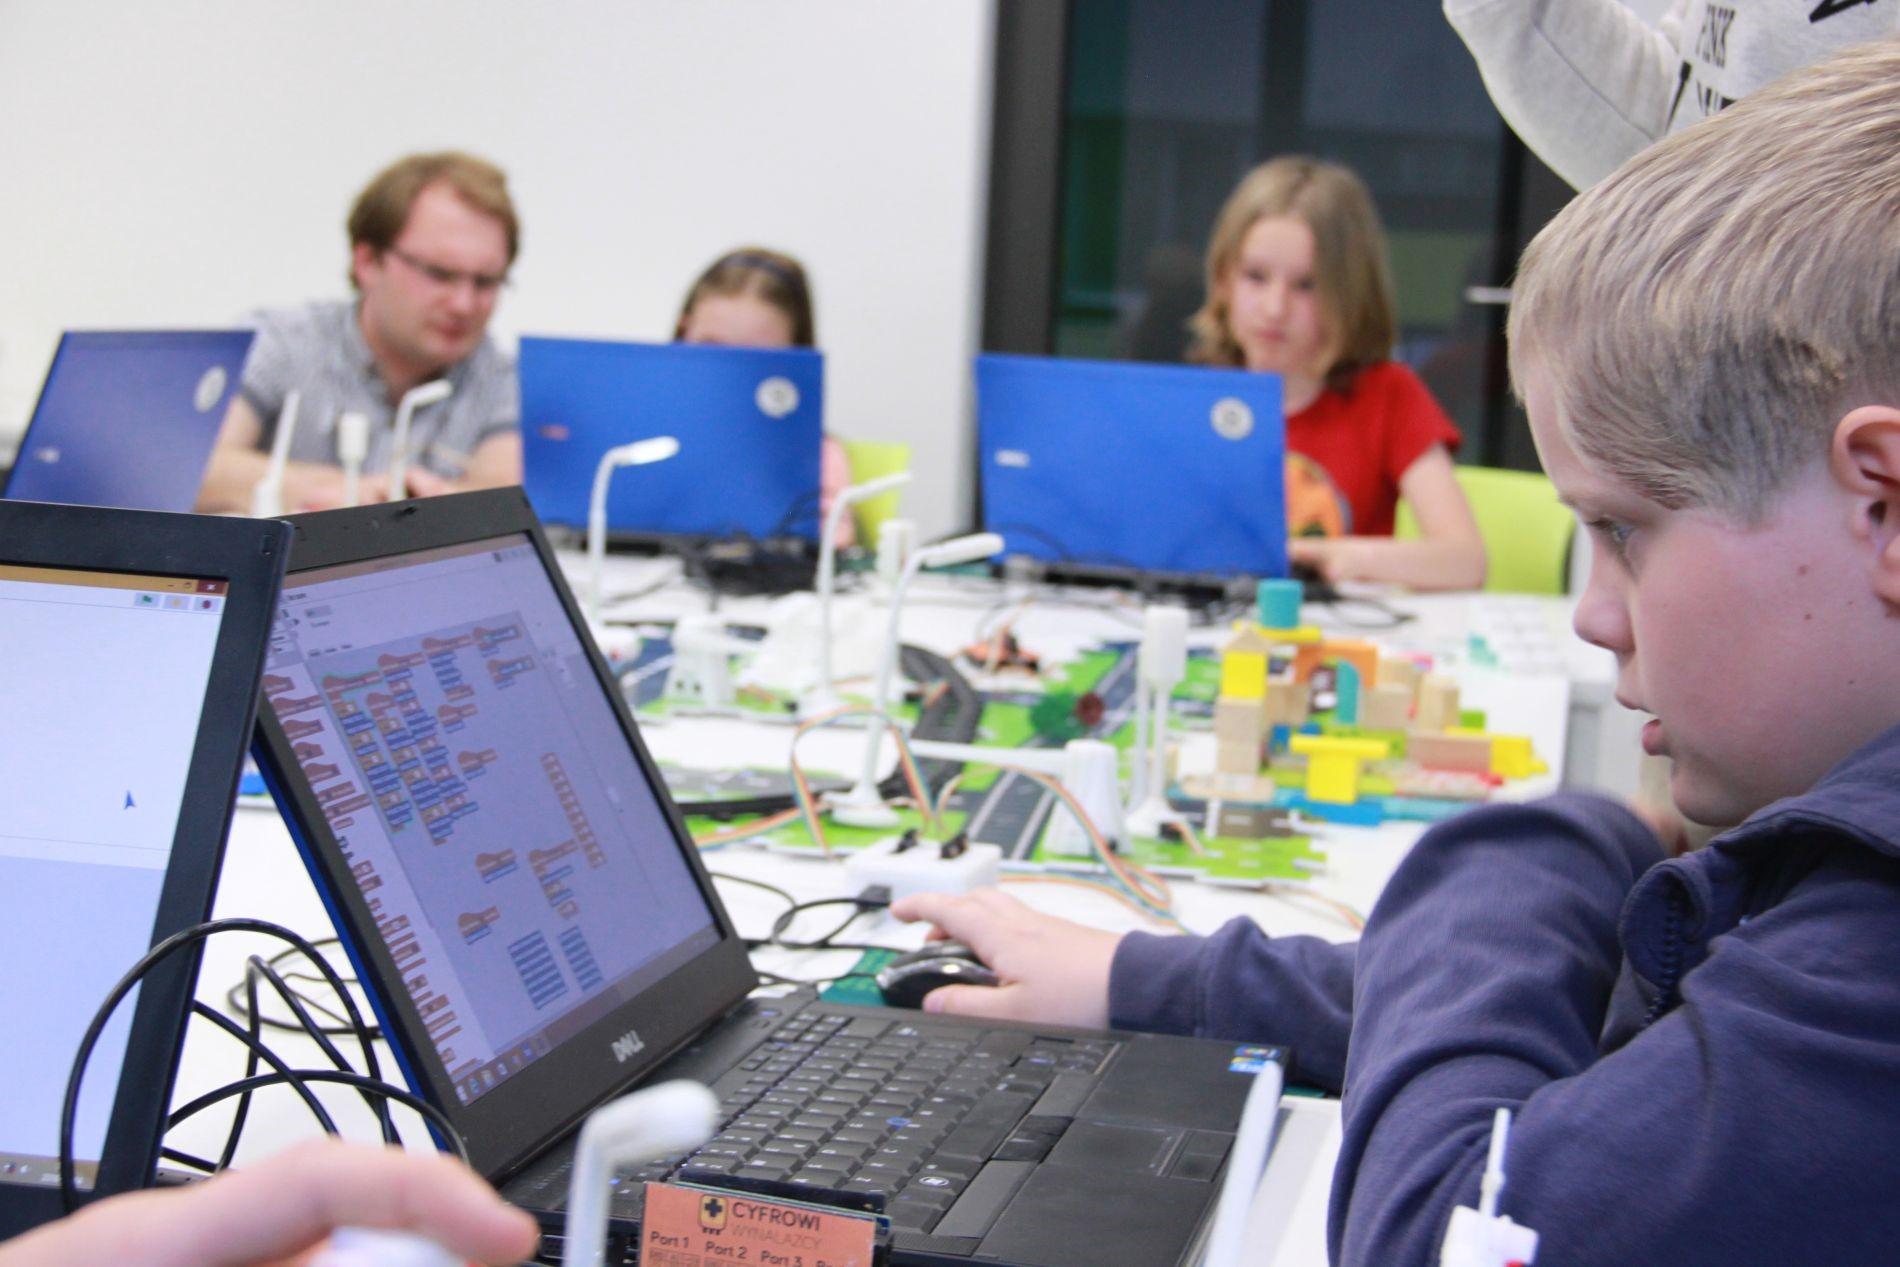 Inteligentne miasto i nauka programowania